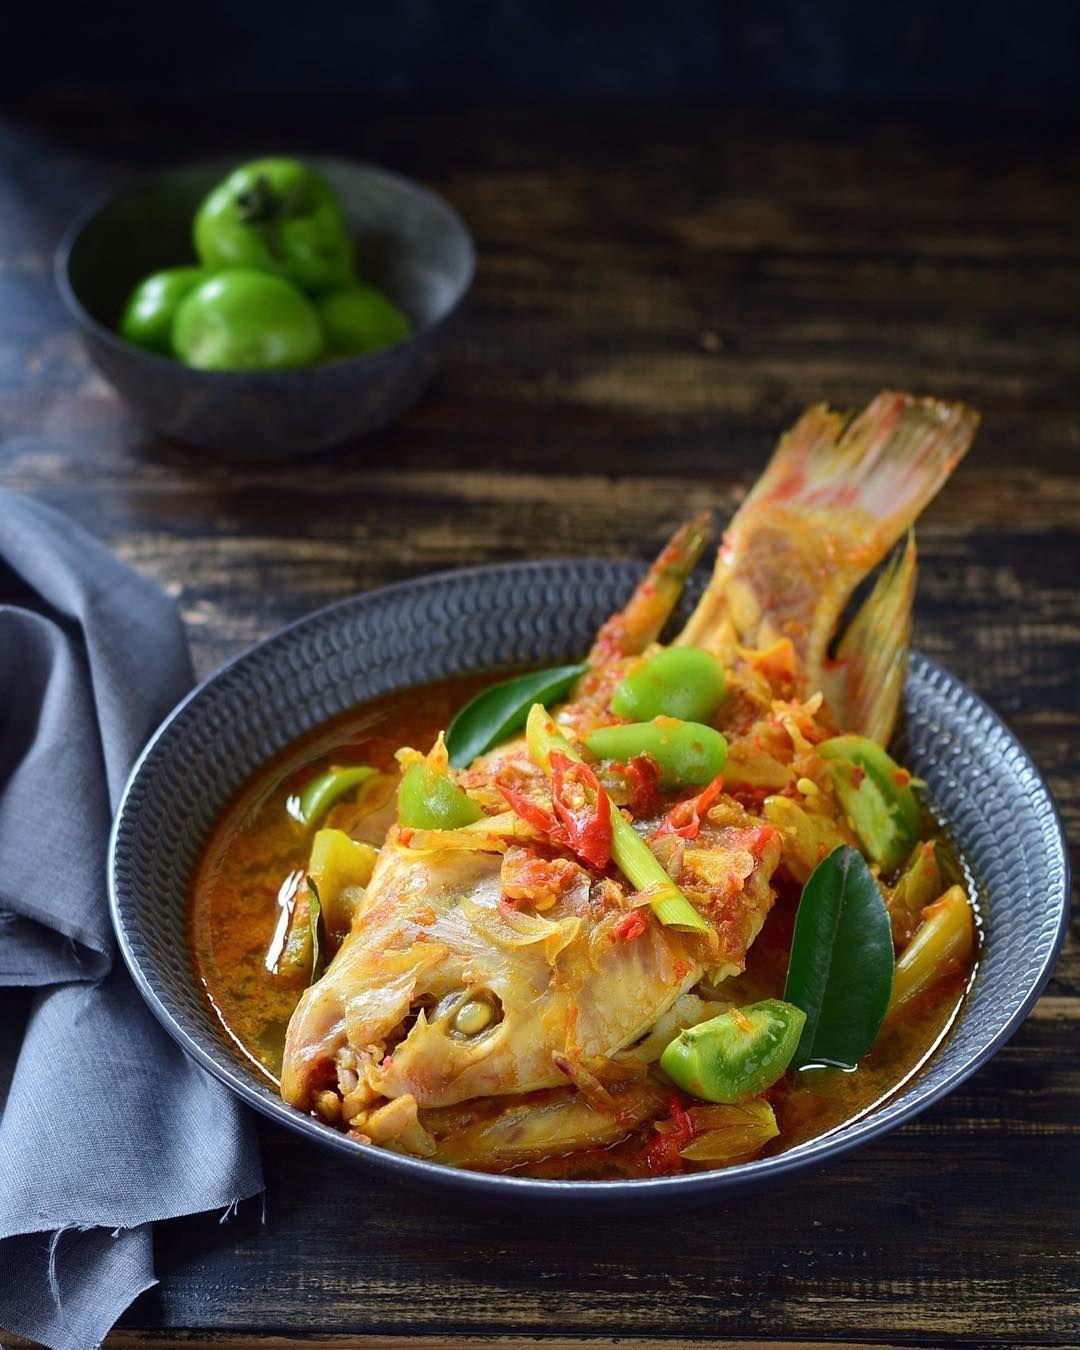 Resep Masakan Ikan Nila Asam Padeh Resep Masakan Masakan Resep Masakan Indonesia